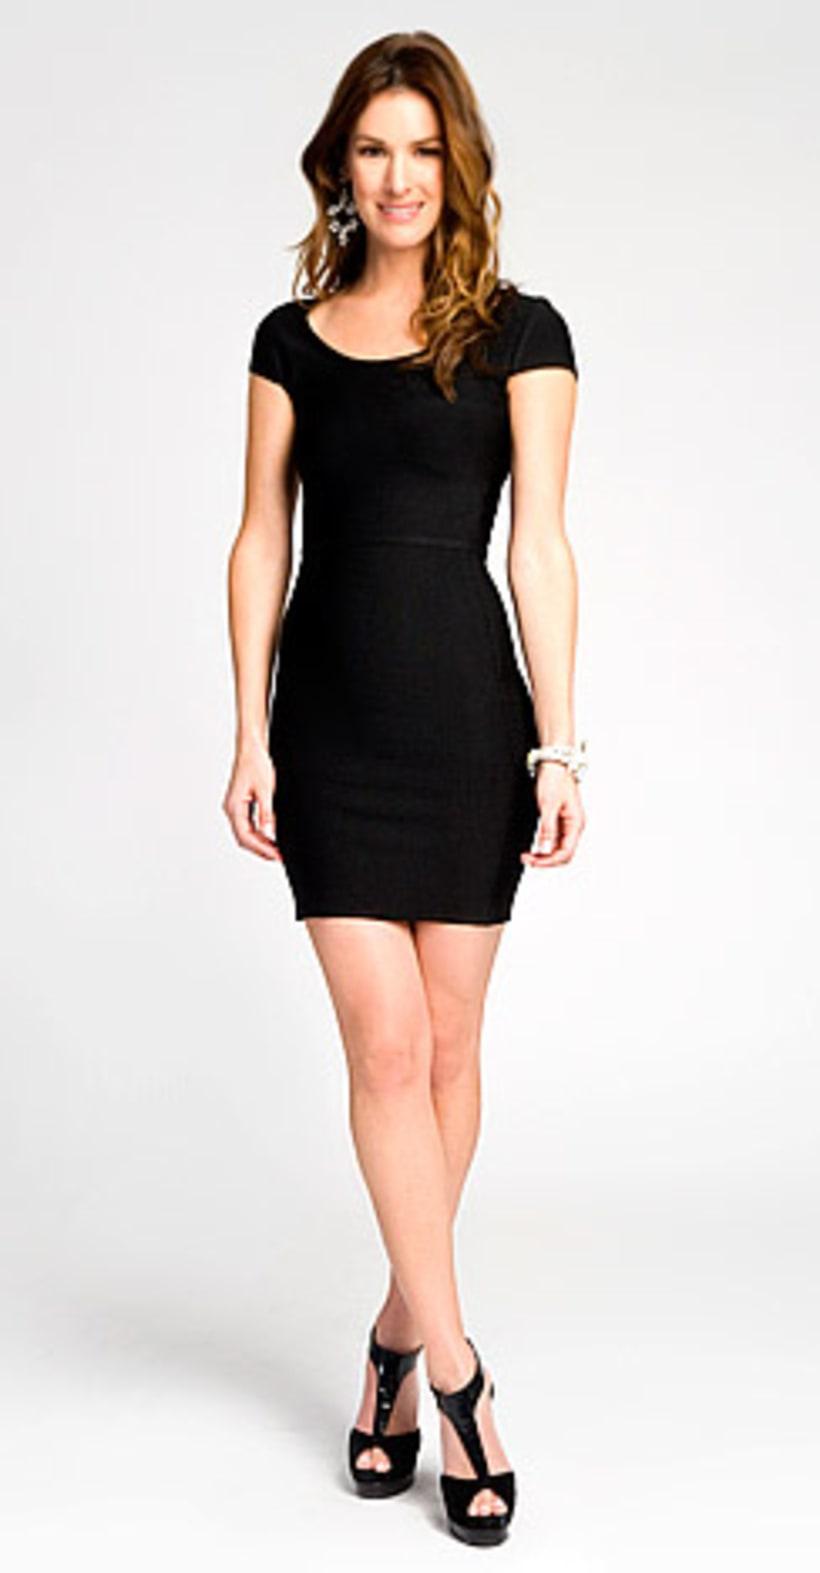 Mini Trend Christmas Inspired Dresses That